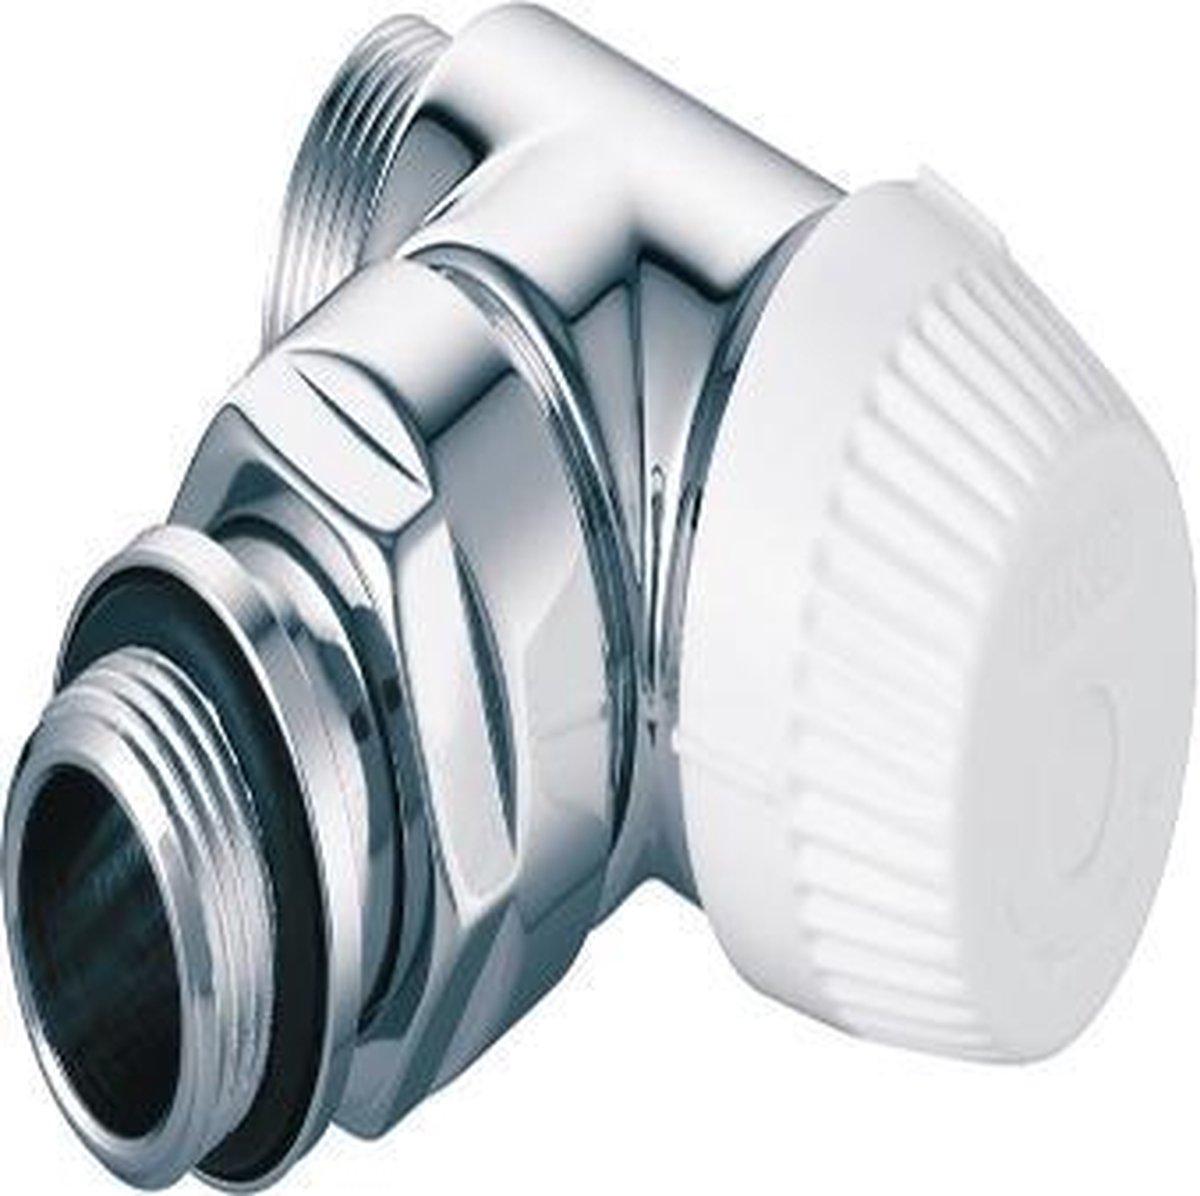 "Honeywell Ultraline thera design radiatorafsluiter m30x1.5 1/2"" kvs=1.2 dubbel haaks rechts chroom v2082rsl15"